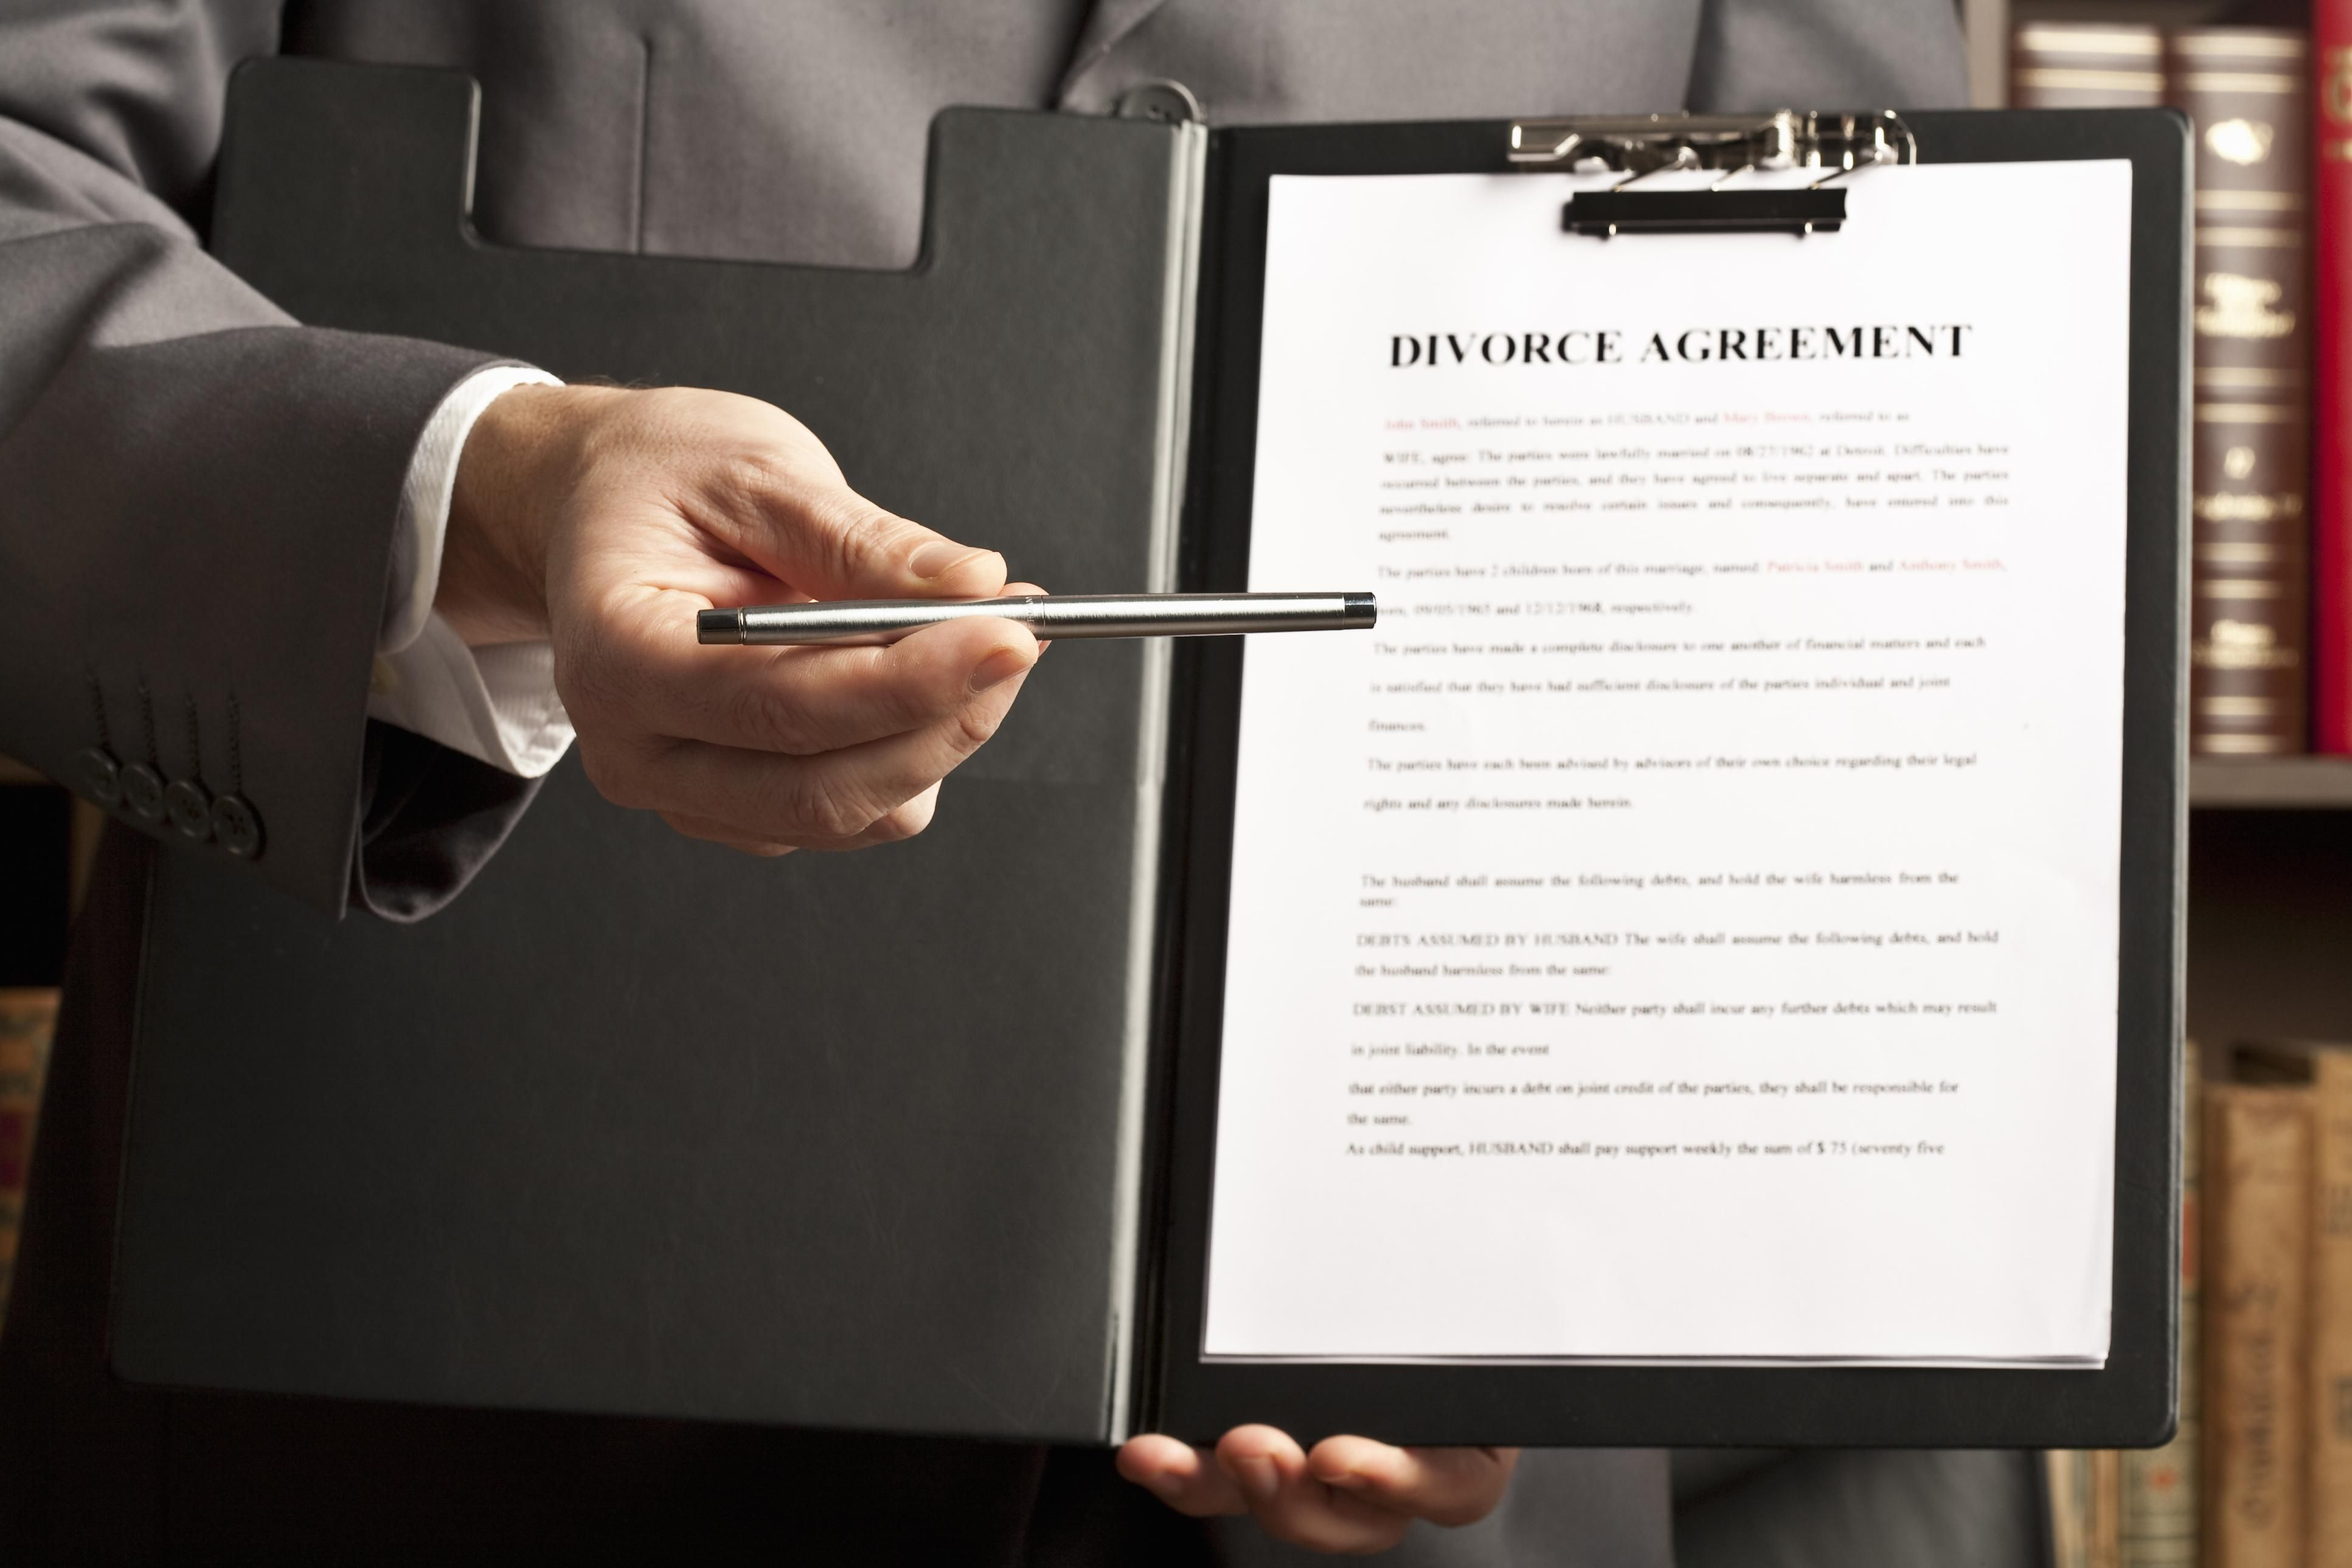 Find lawyers online